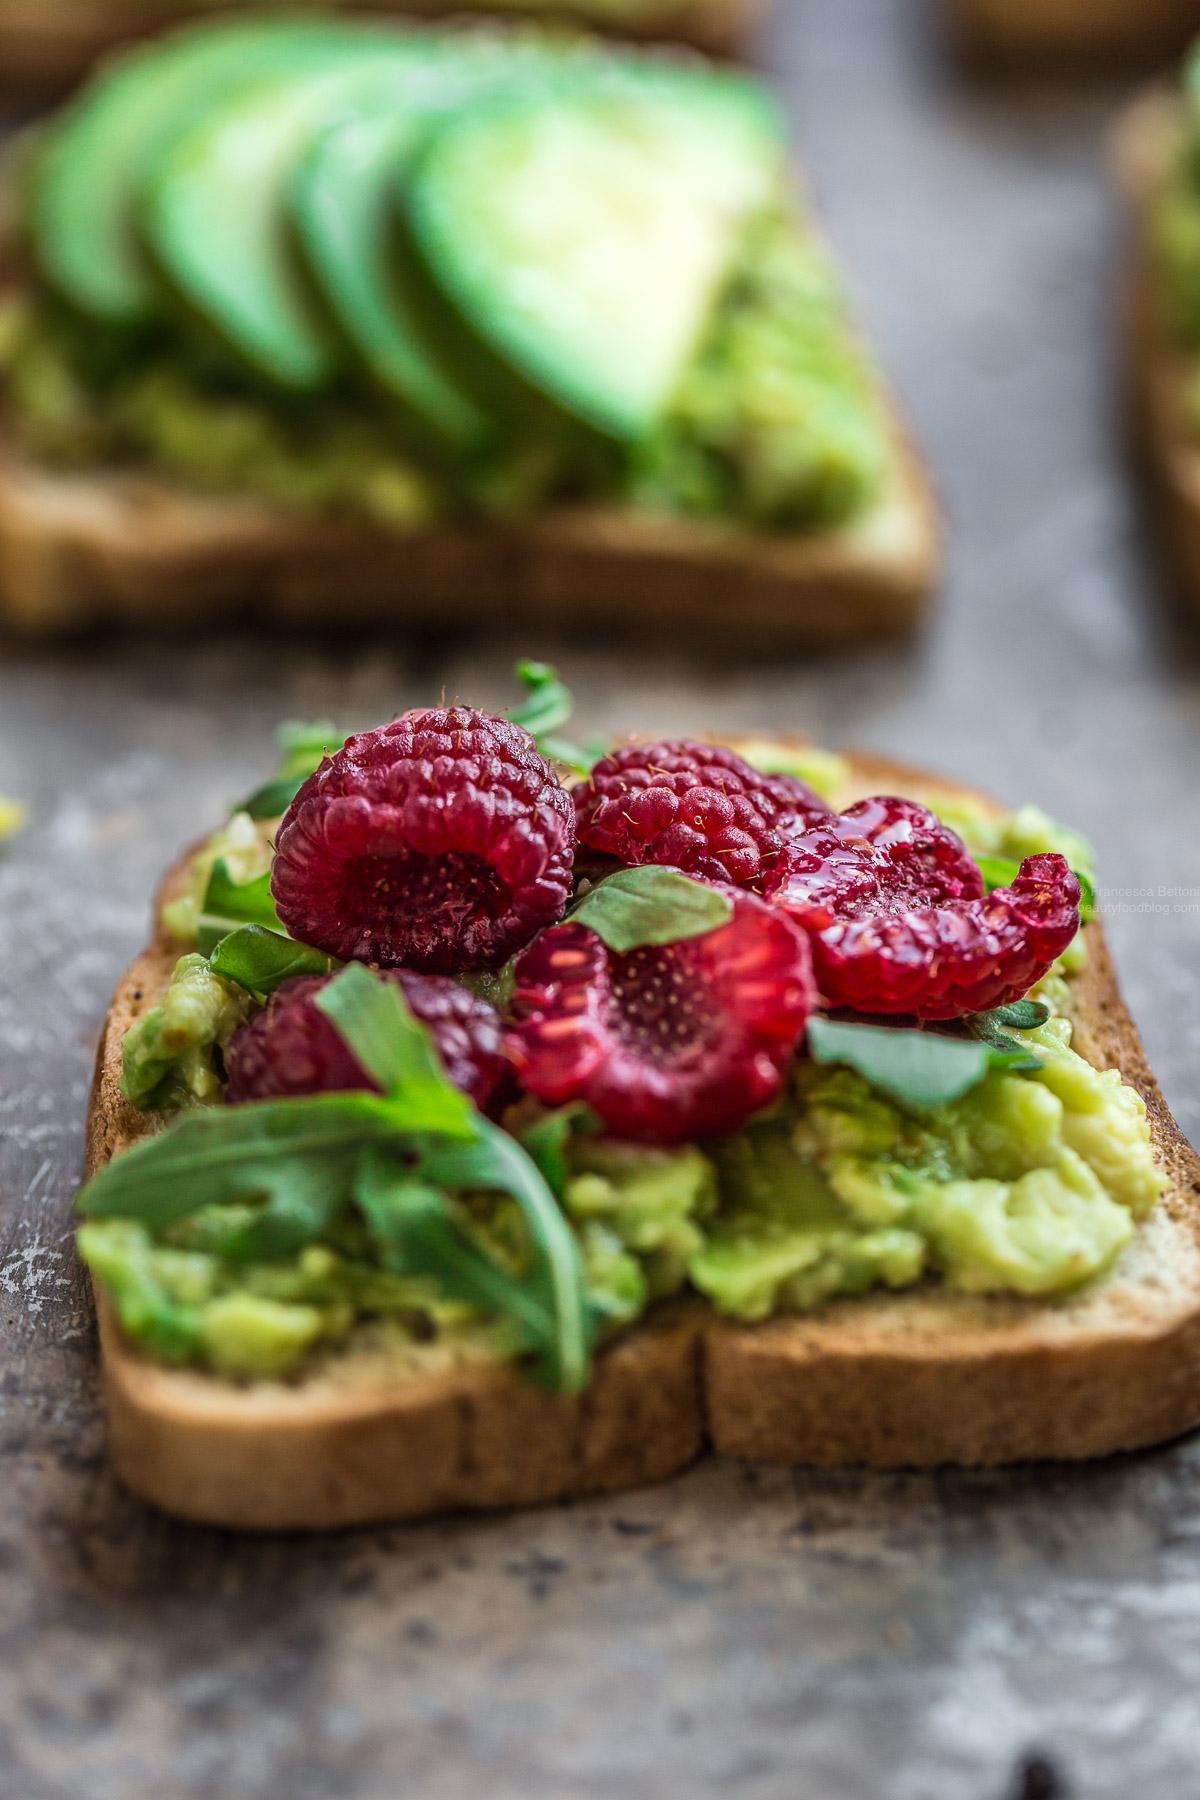 glutenfree vegan avocado toast recipe with raspberry and balsamic vinegar - ricetta avocado toast vegan senza glutine con lamponi e aceto balsamico